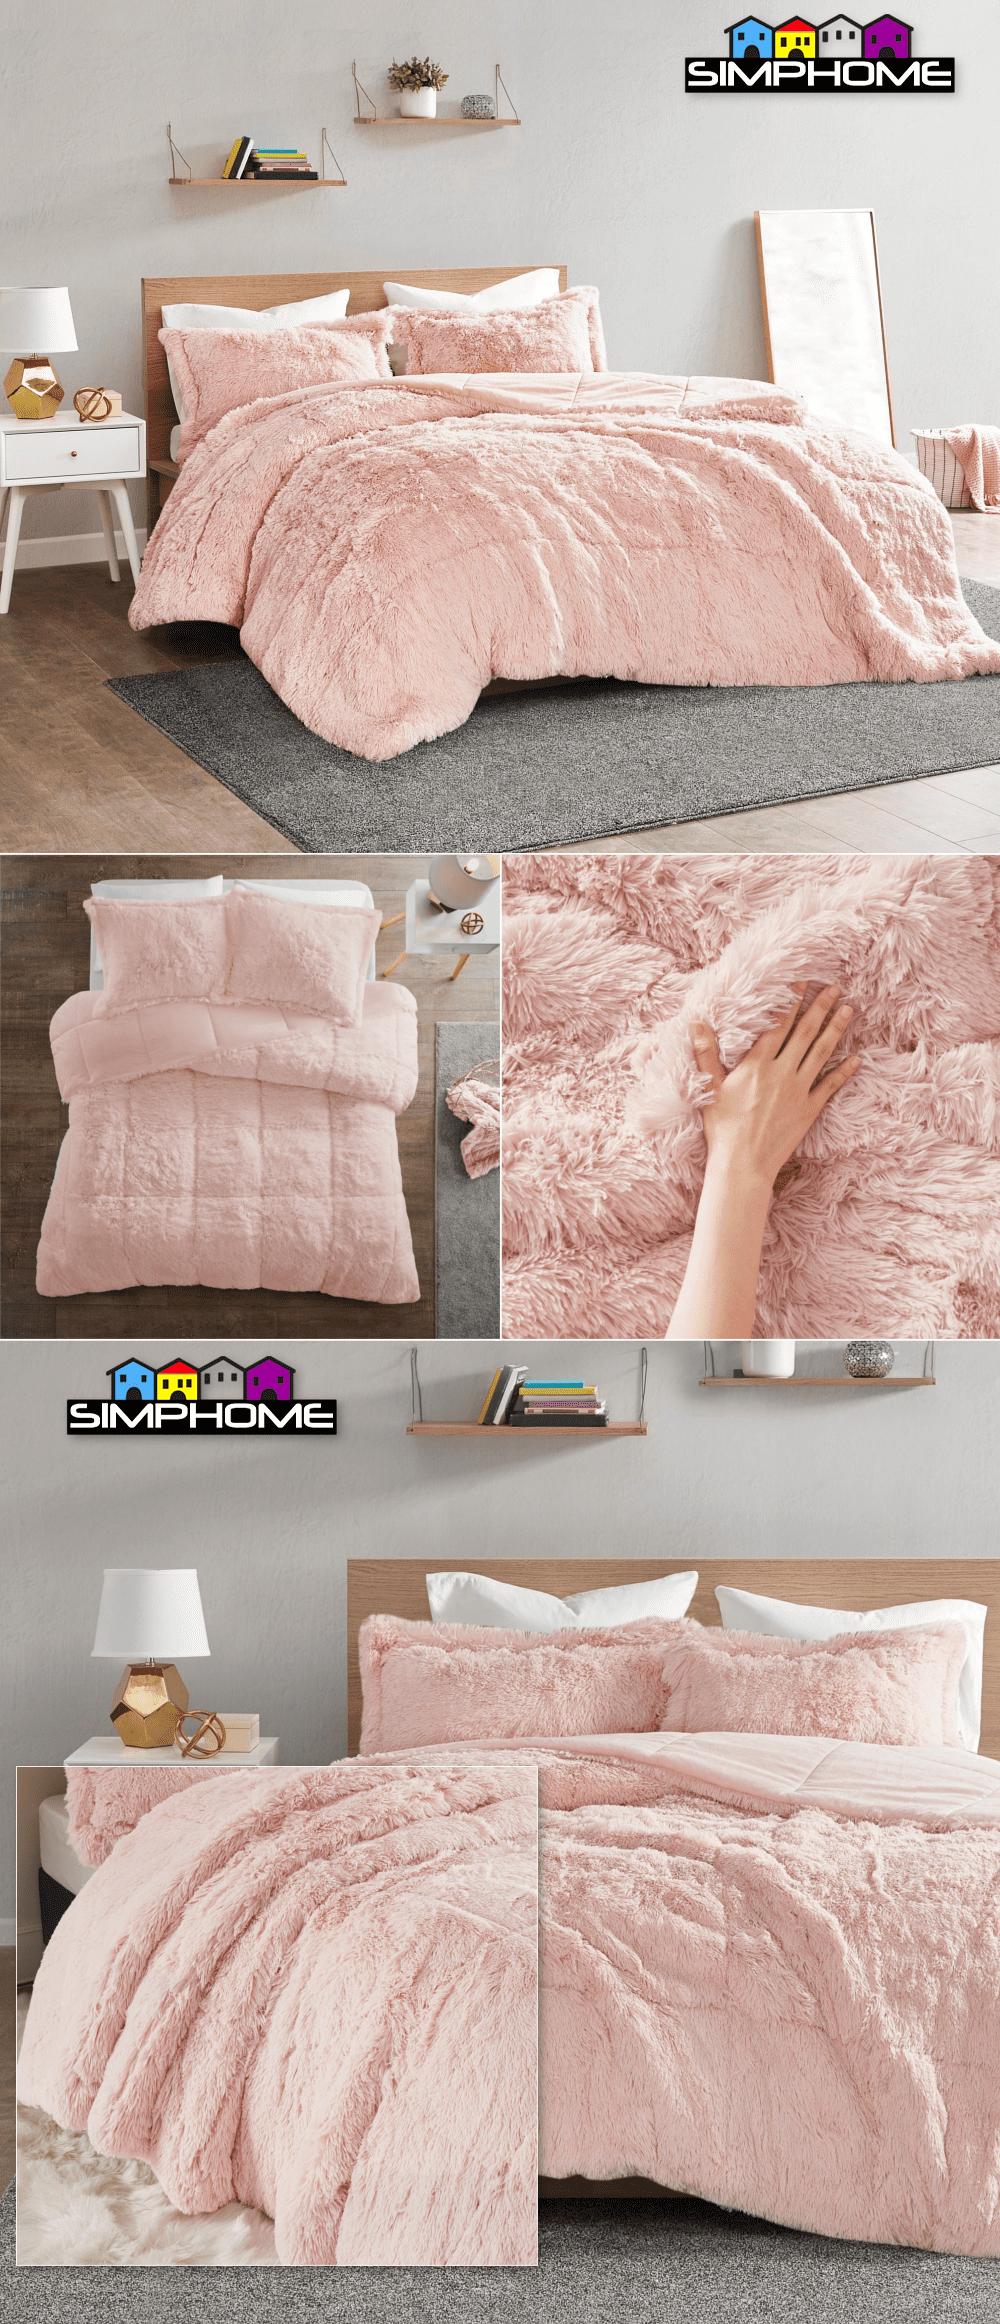 1.Soft Faux Fur Comforter idea via simphome.com